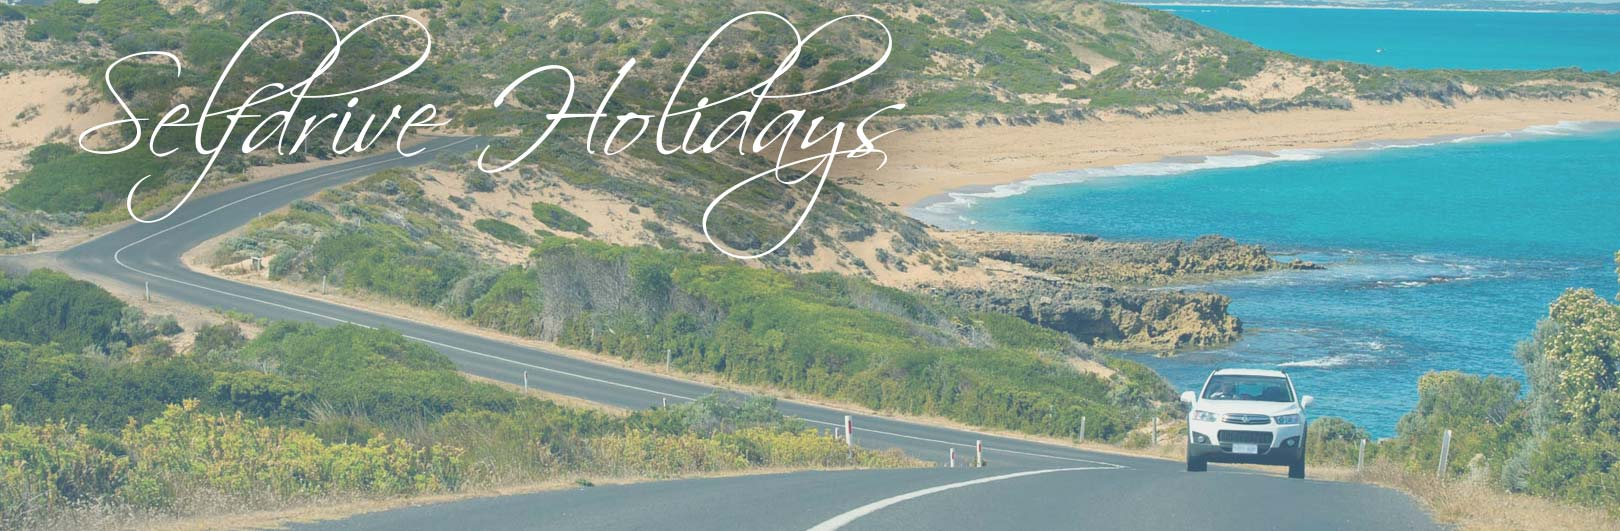 Self Drive Holidays